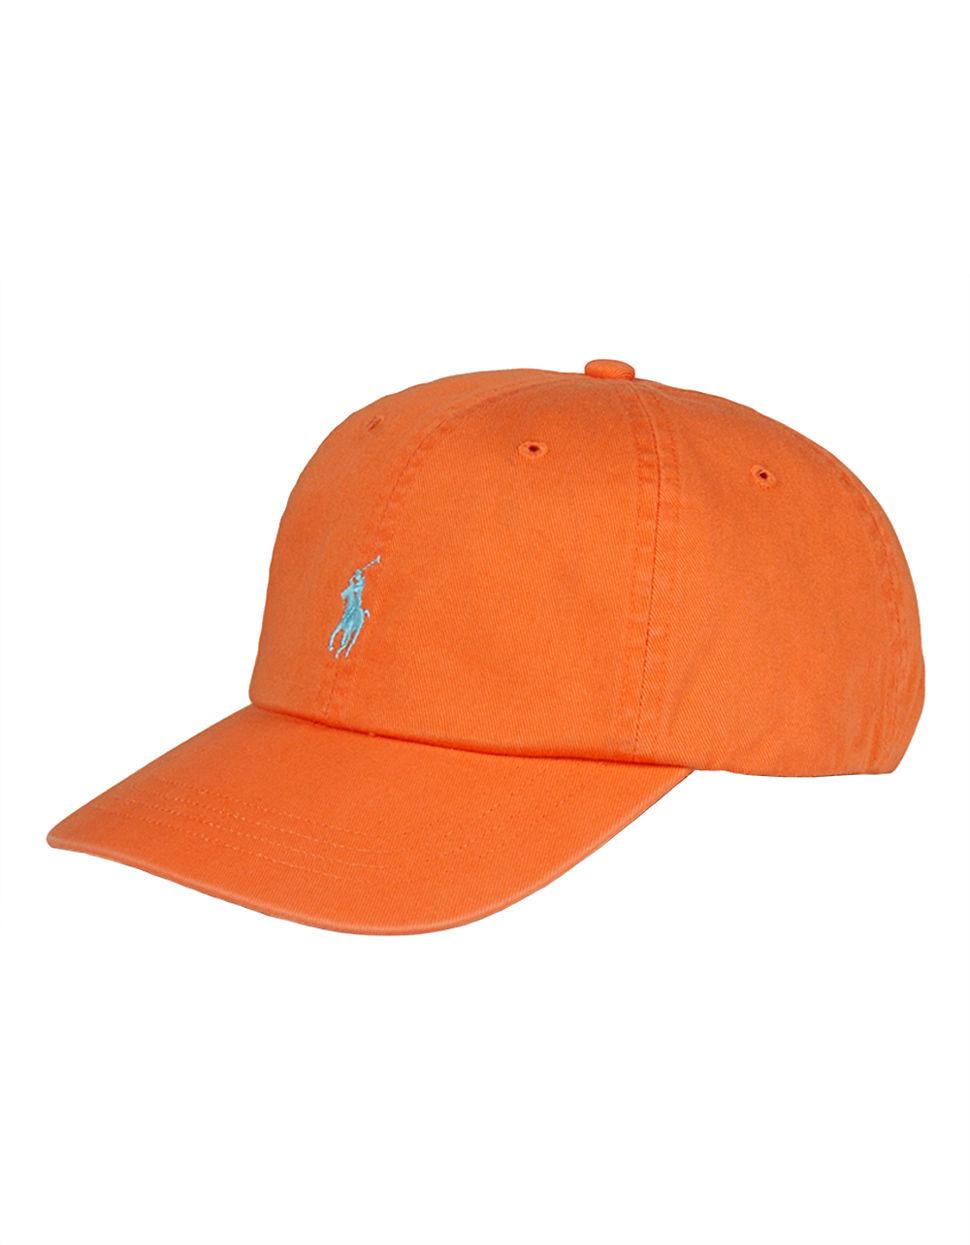 polo ralph lauren classic chino sports cap in orange for men lyst. Black Bedroom Furniture Sets. Home Design Ideas